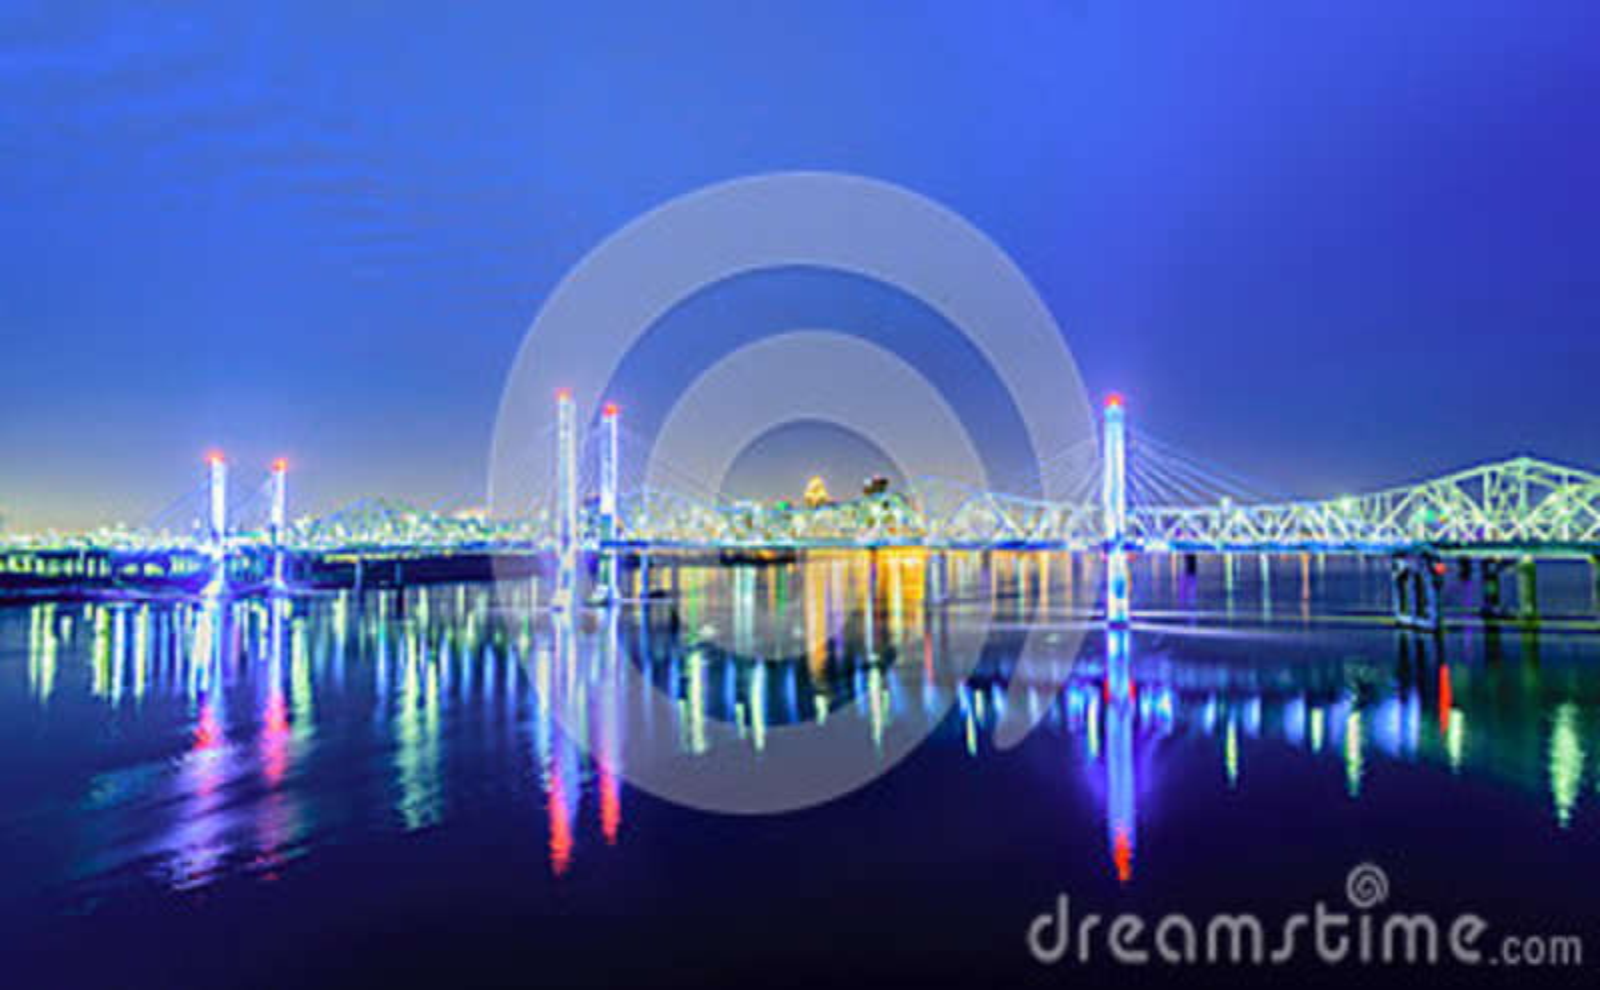 Bridges of Louisville KY at dawn